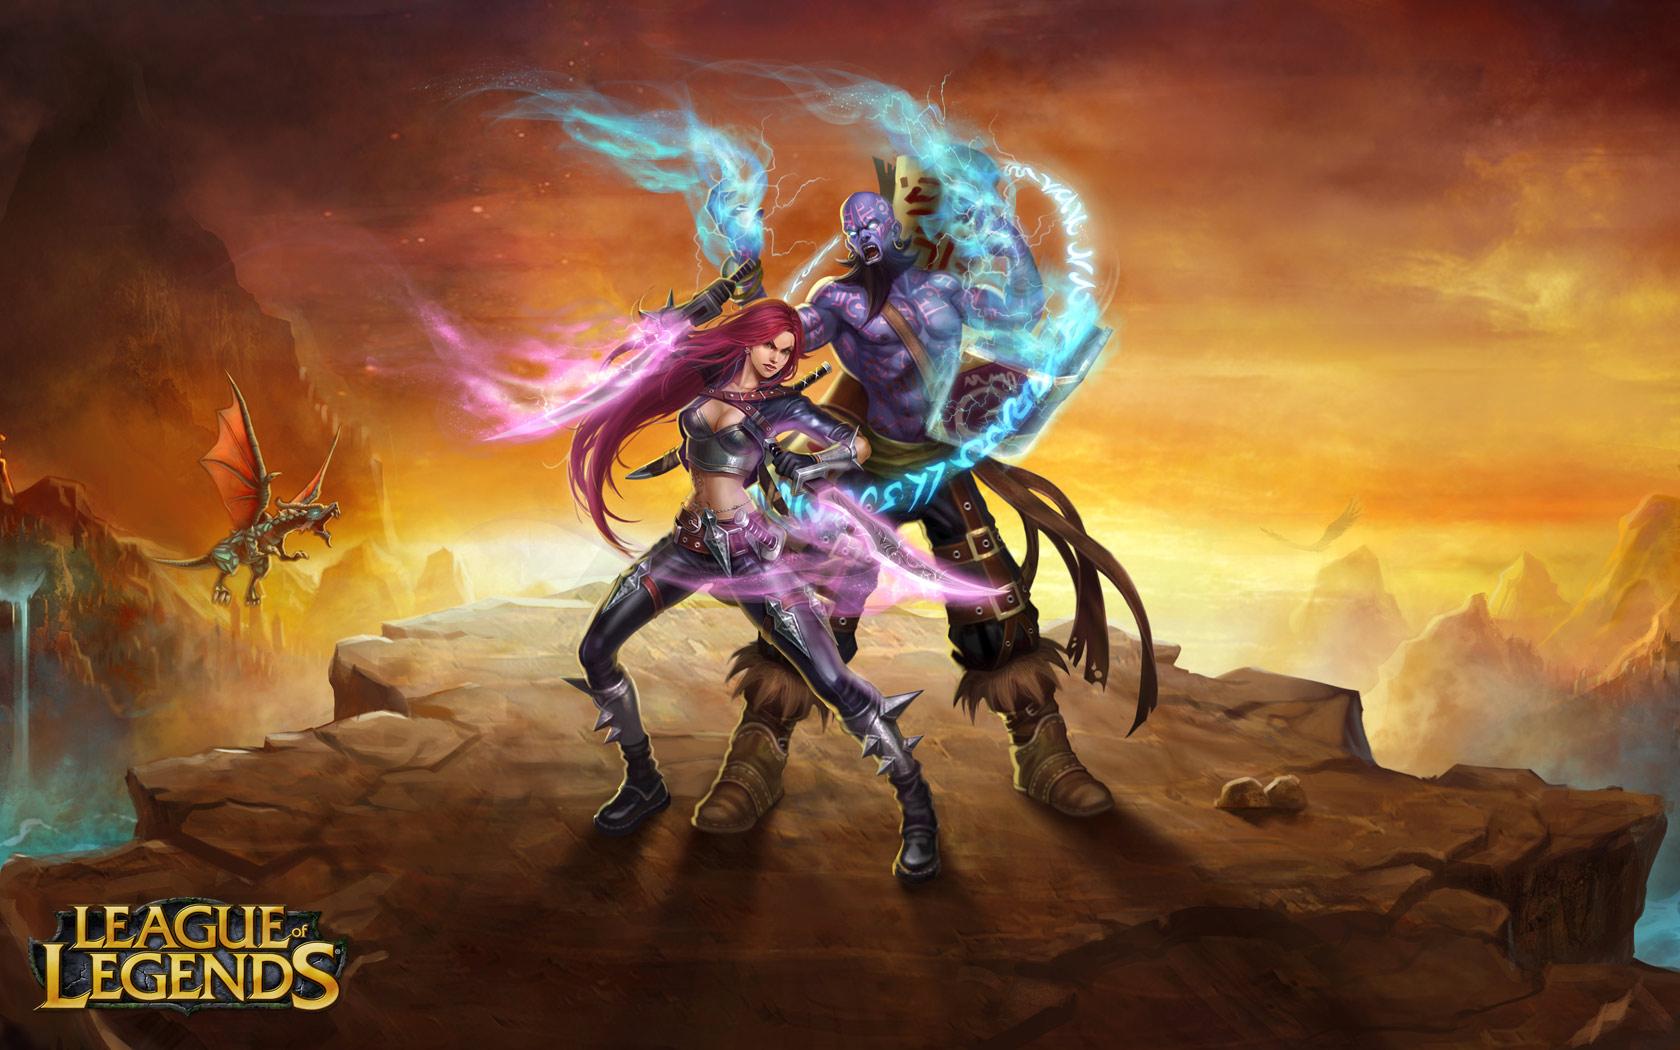 League of Legends wallpaper 6